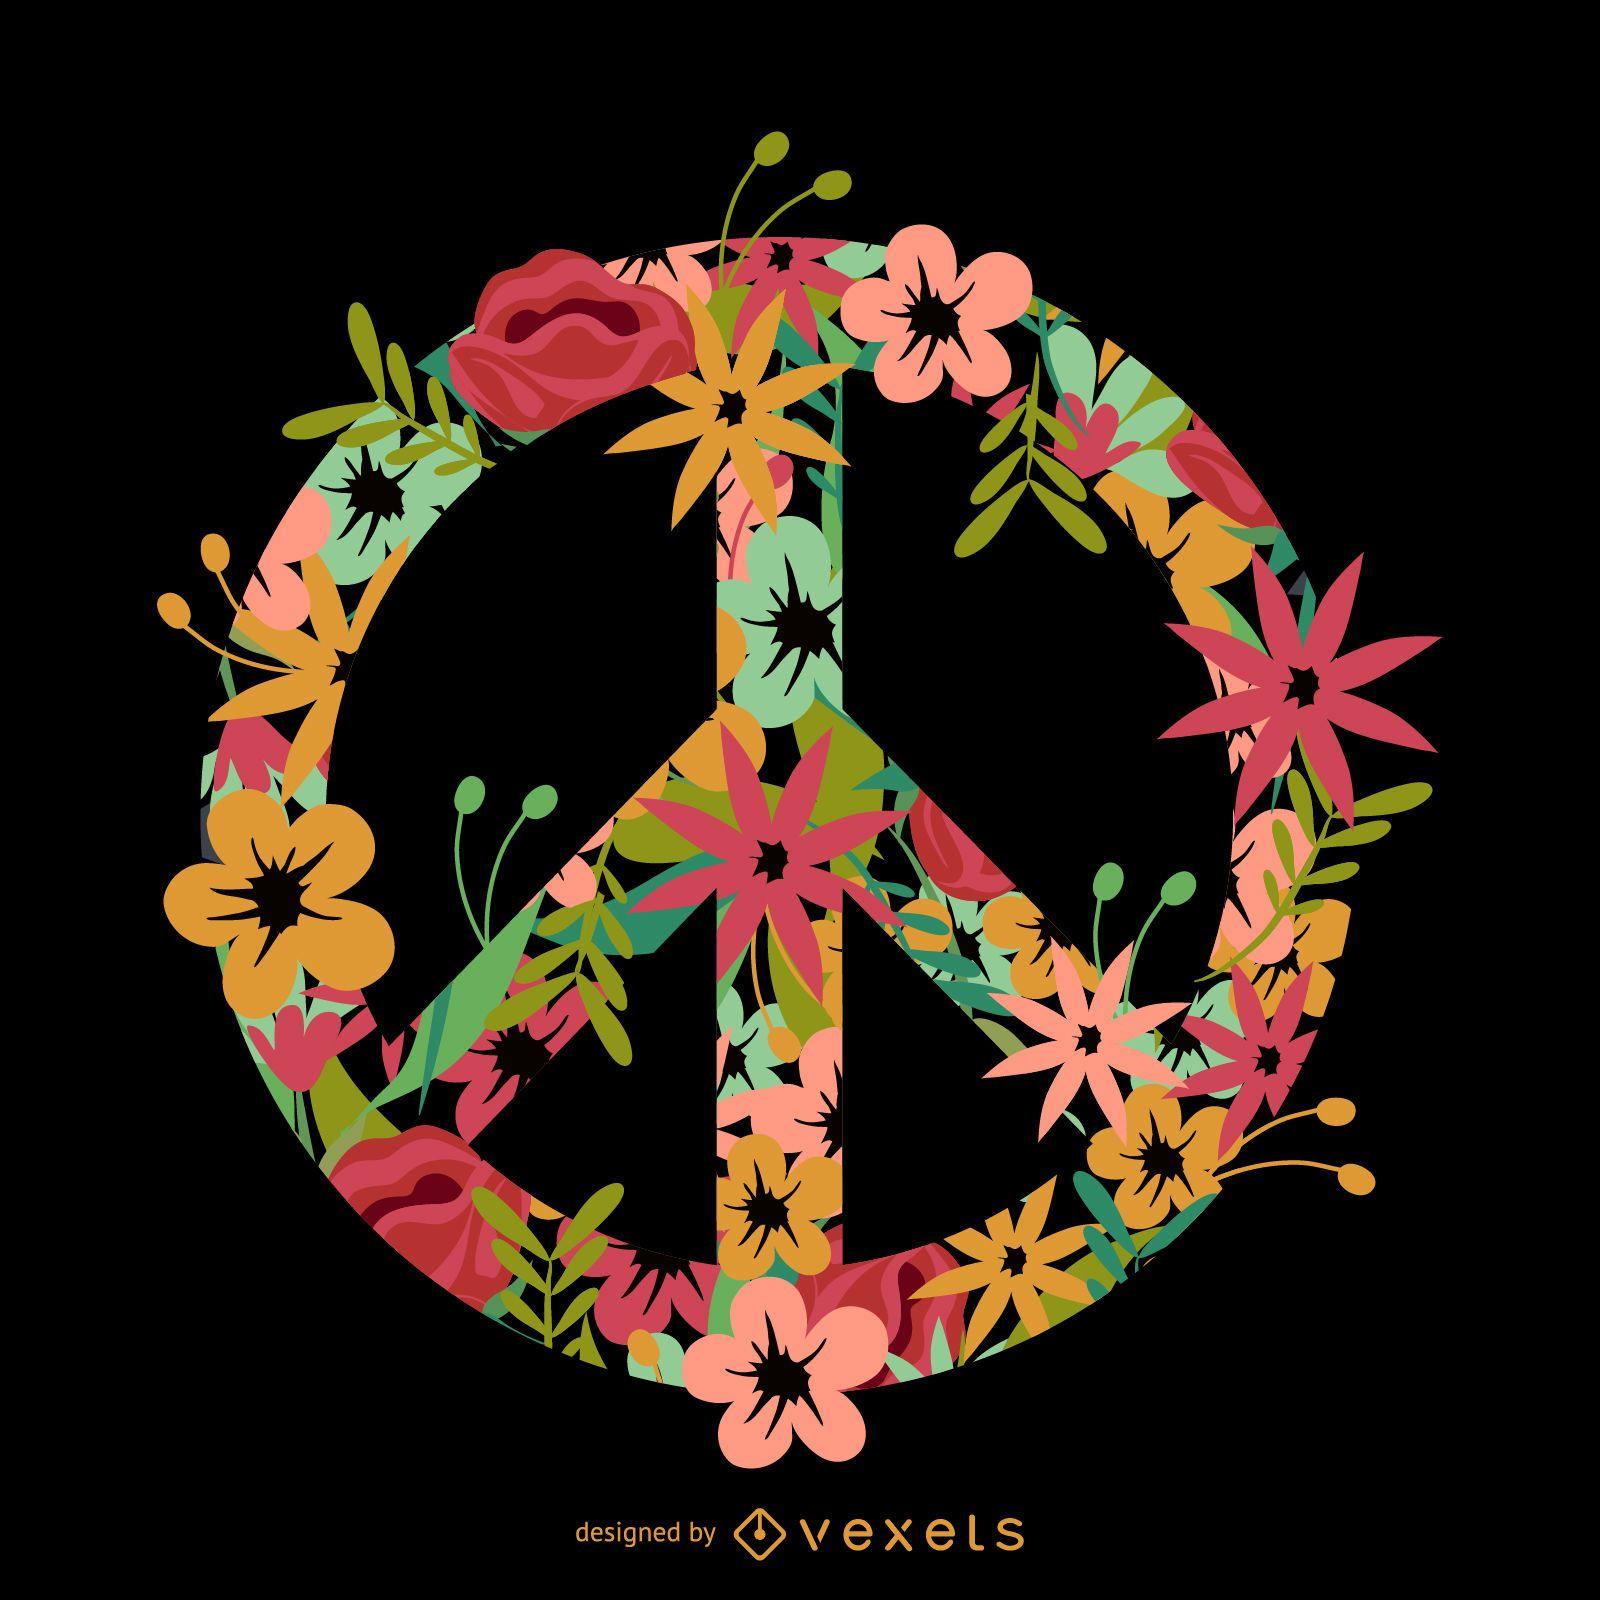 Flower embedded peace symbol